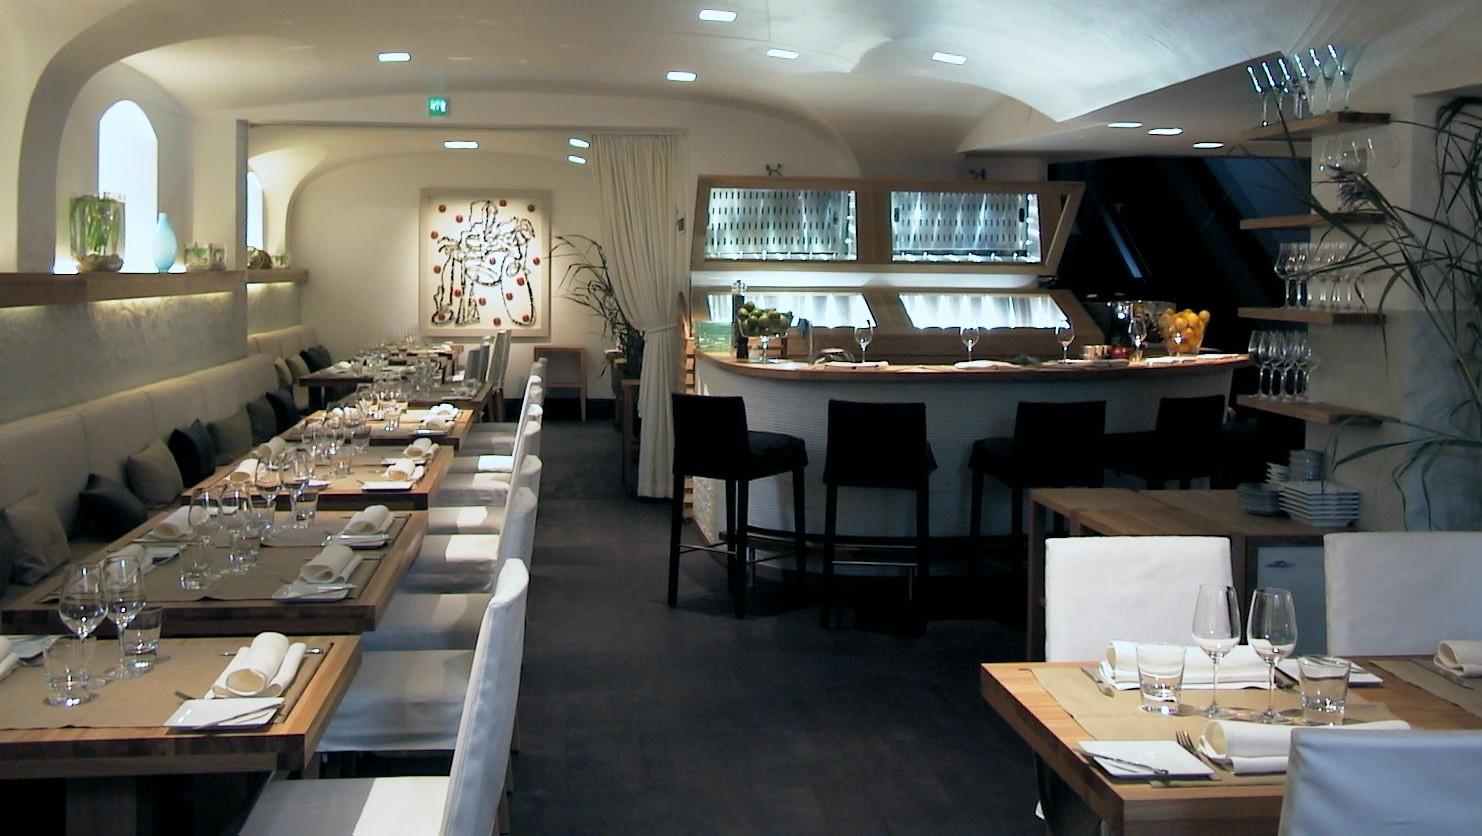 Restaurant-Fishmarket-Helsinki-GI-Project-4